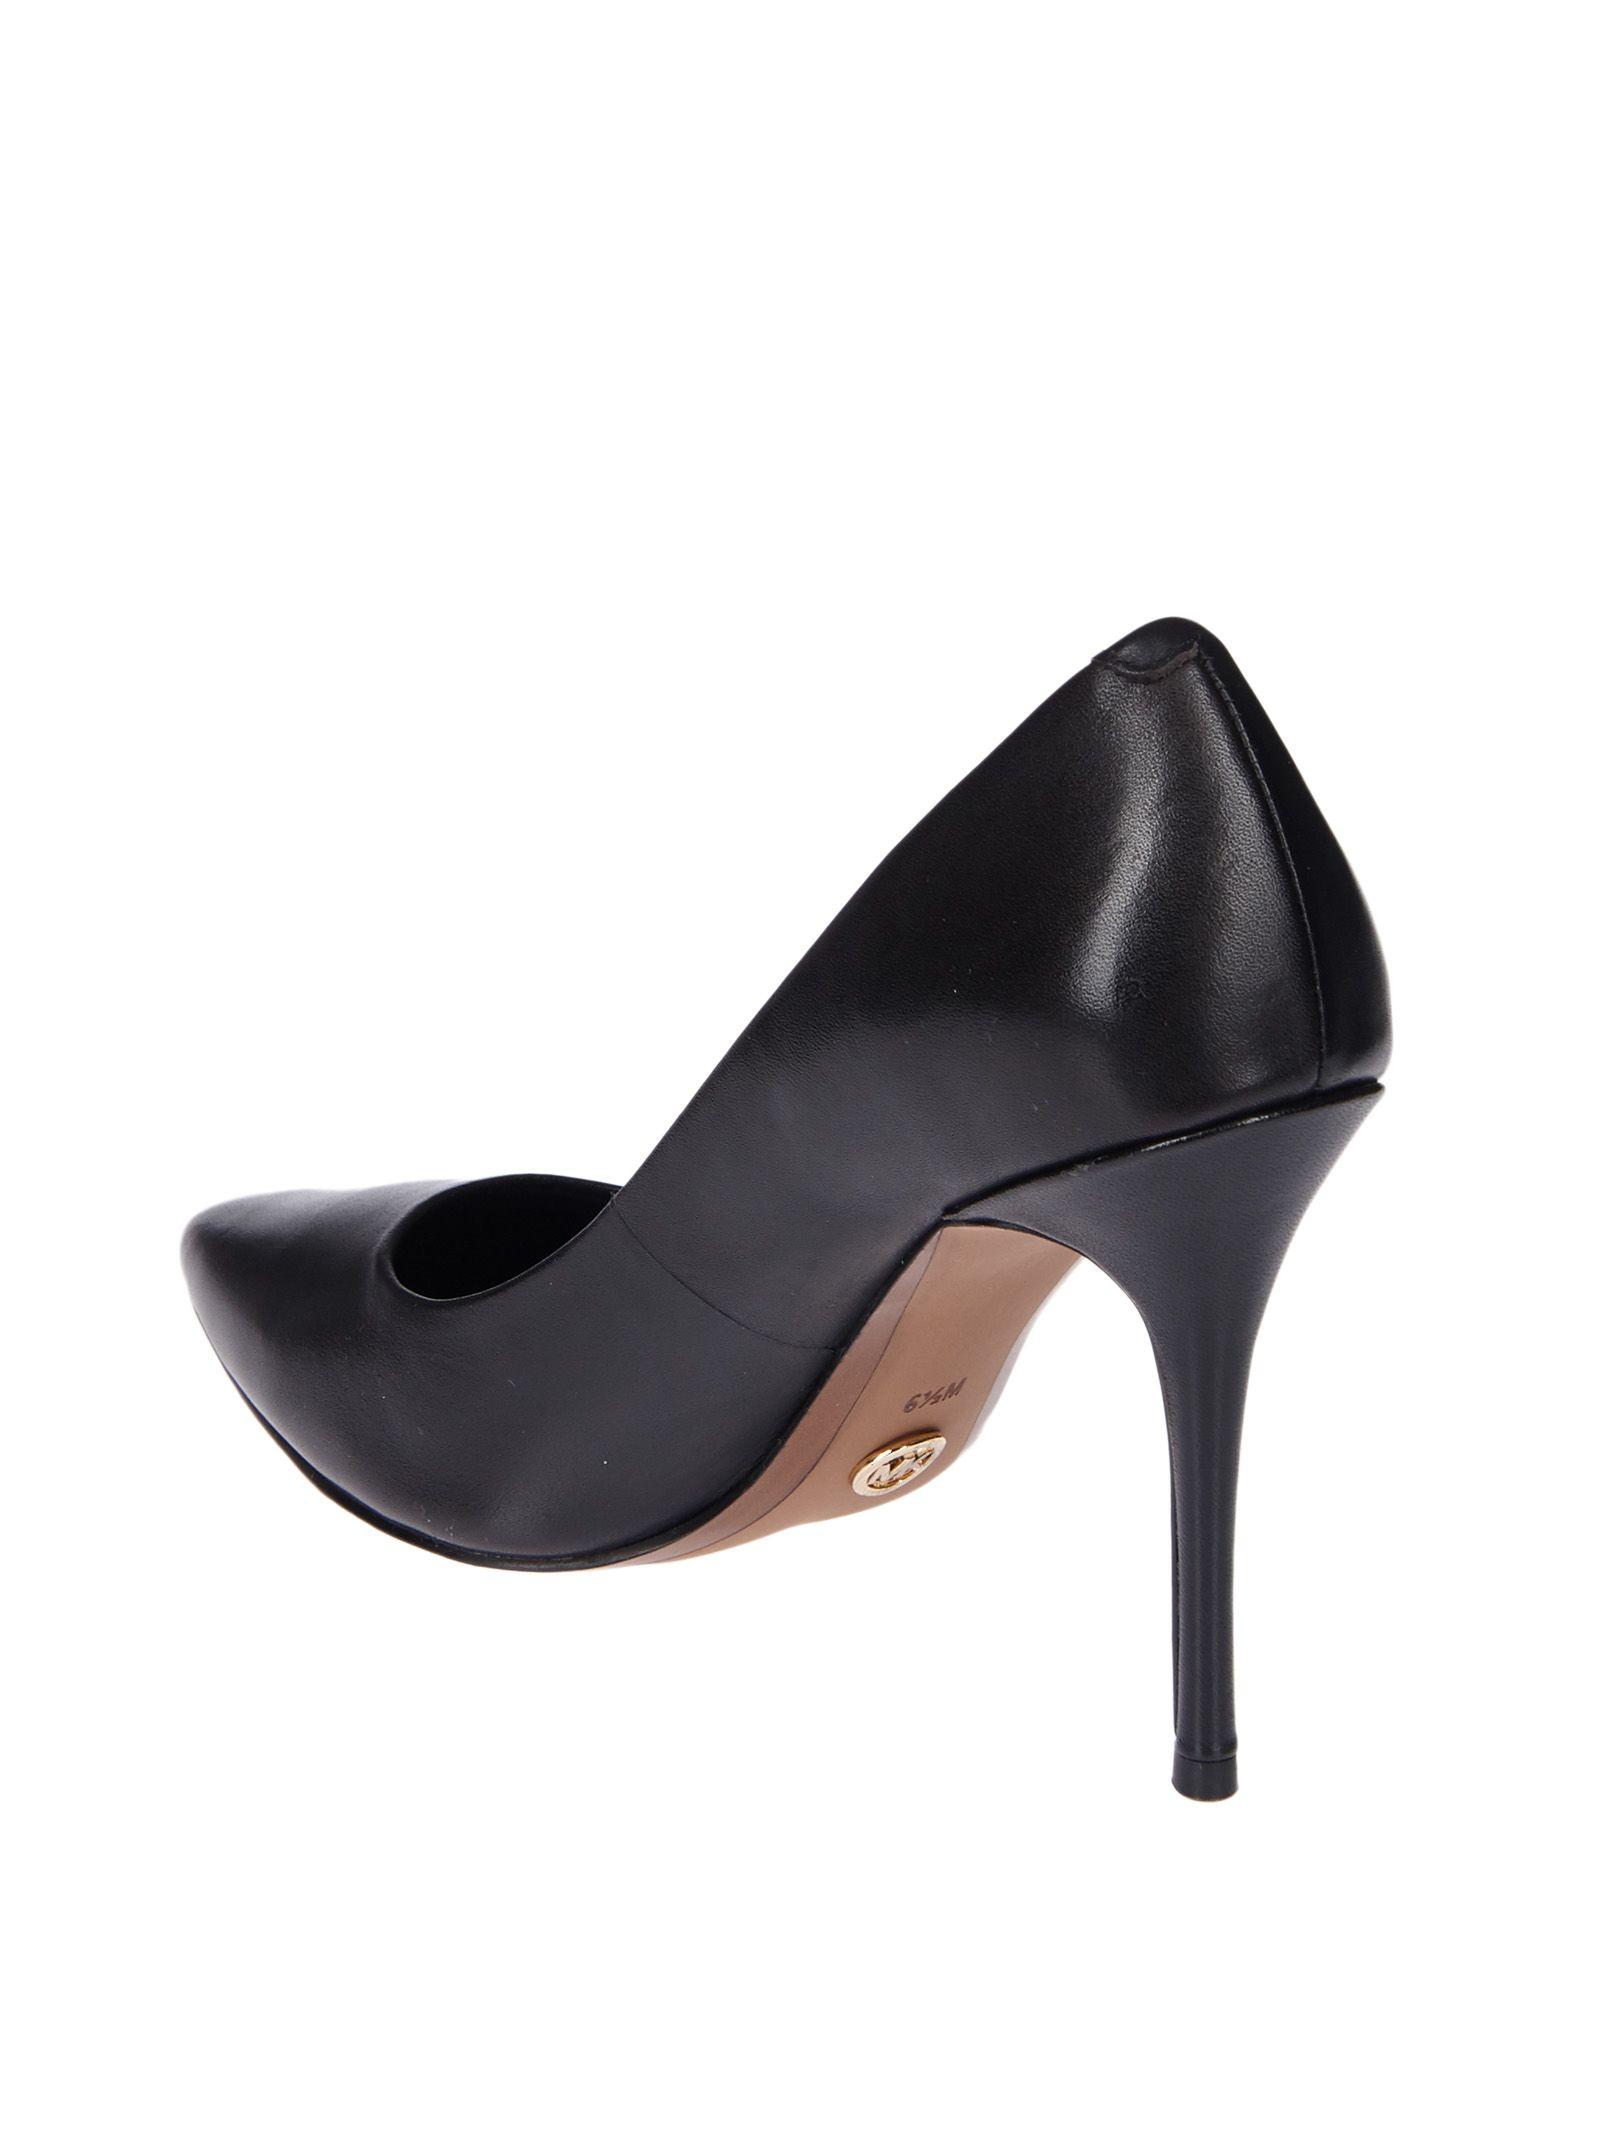 MICHAEL rJI4TGAHKS TIEGAN - High heels - black pPYYxgQ